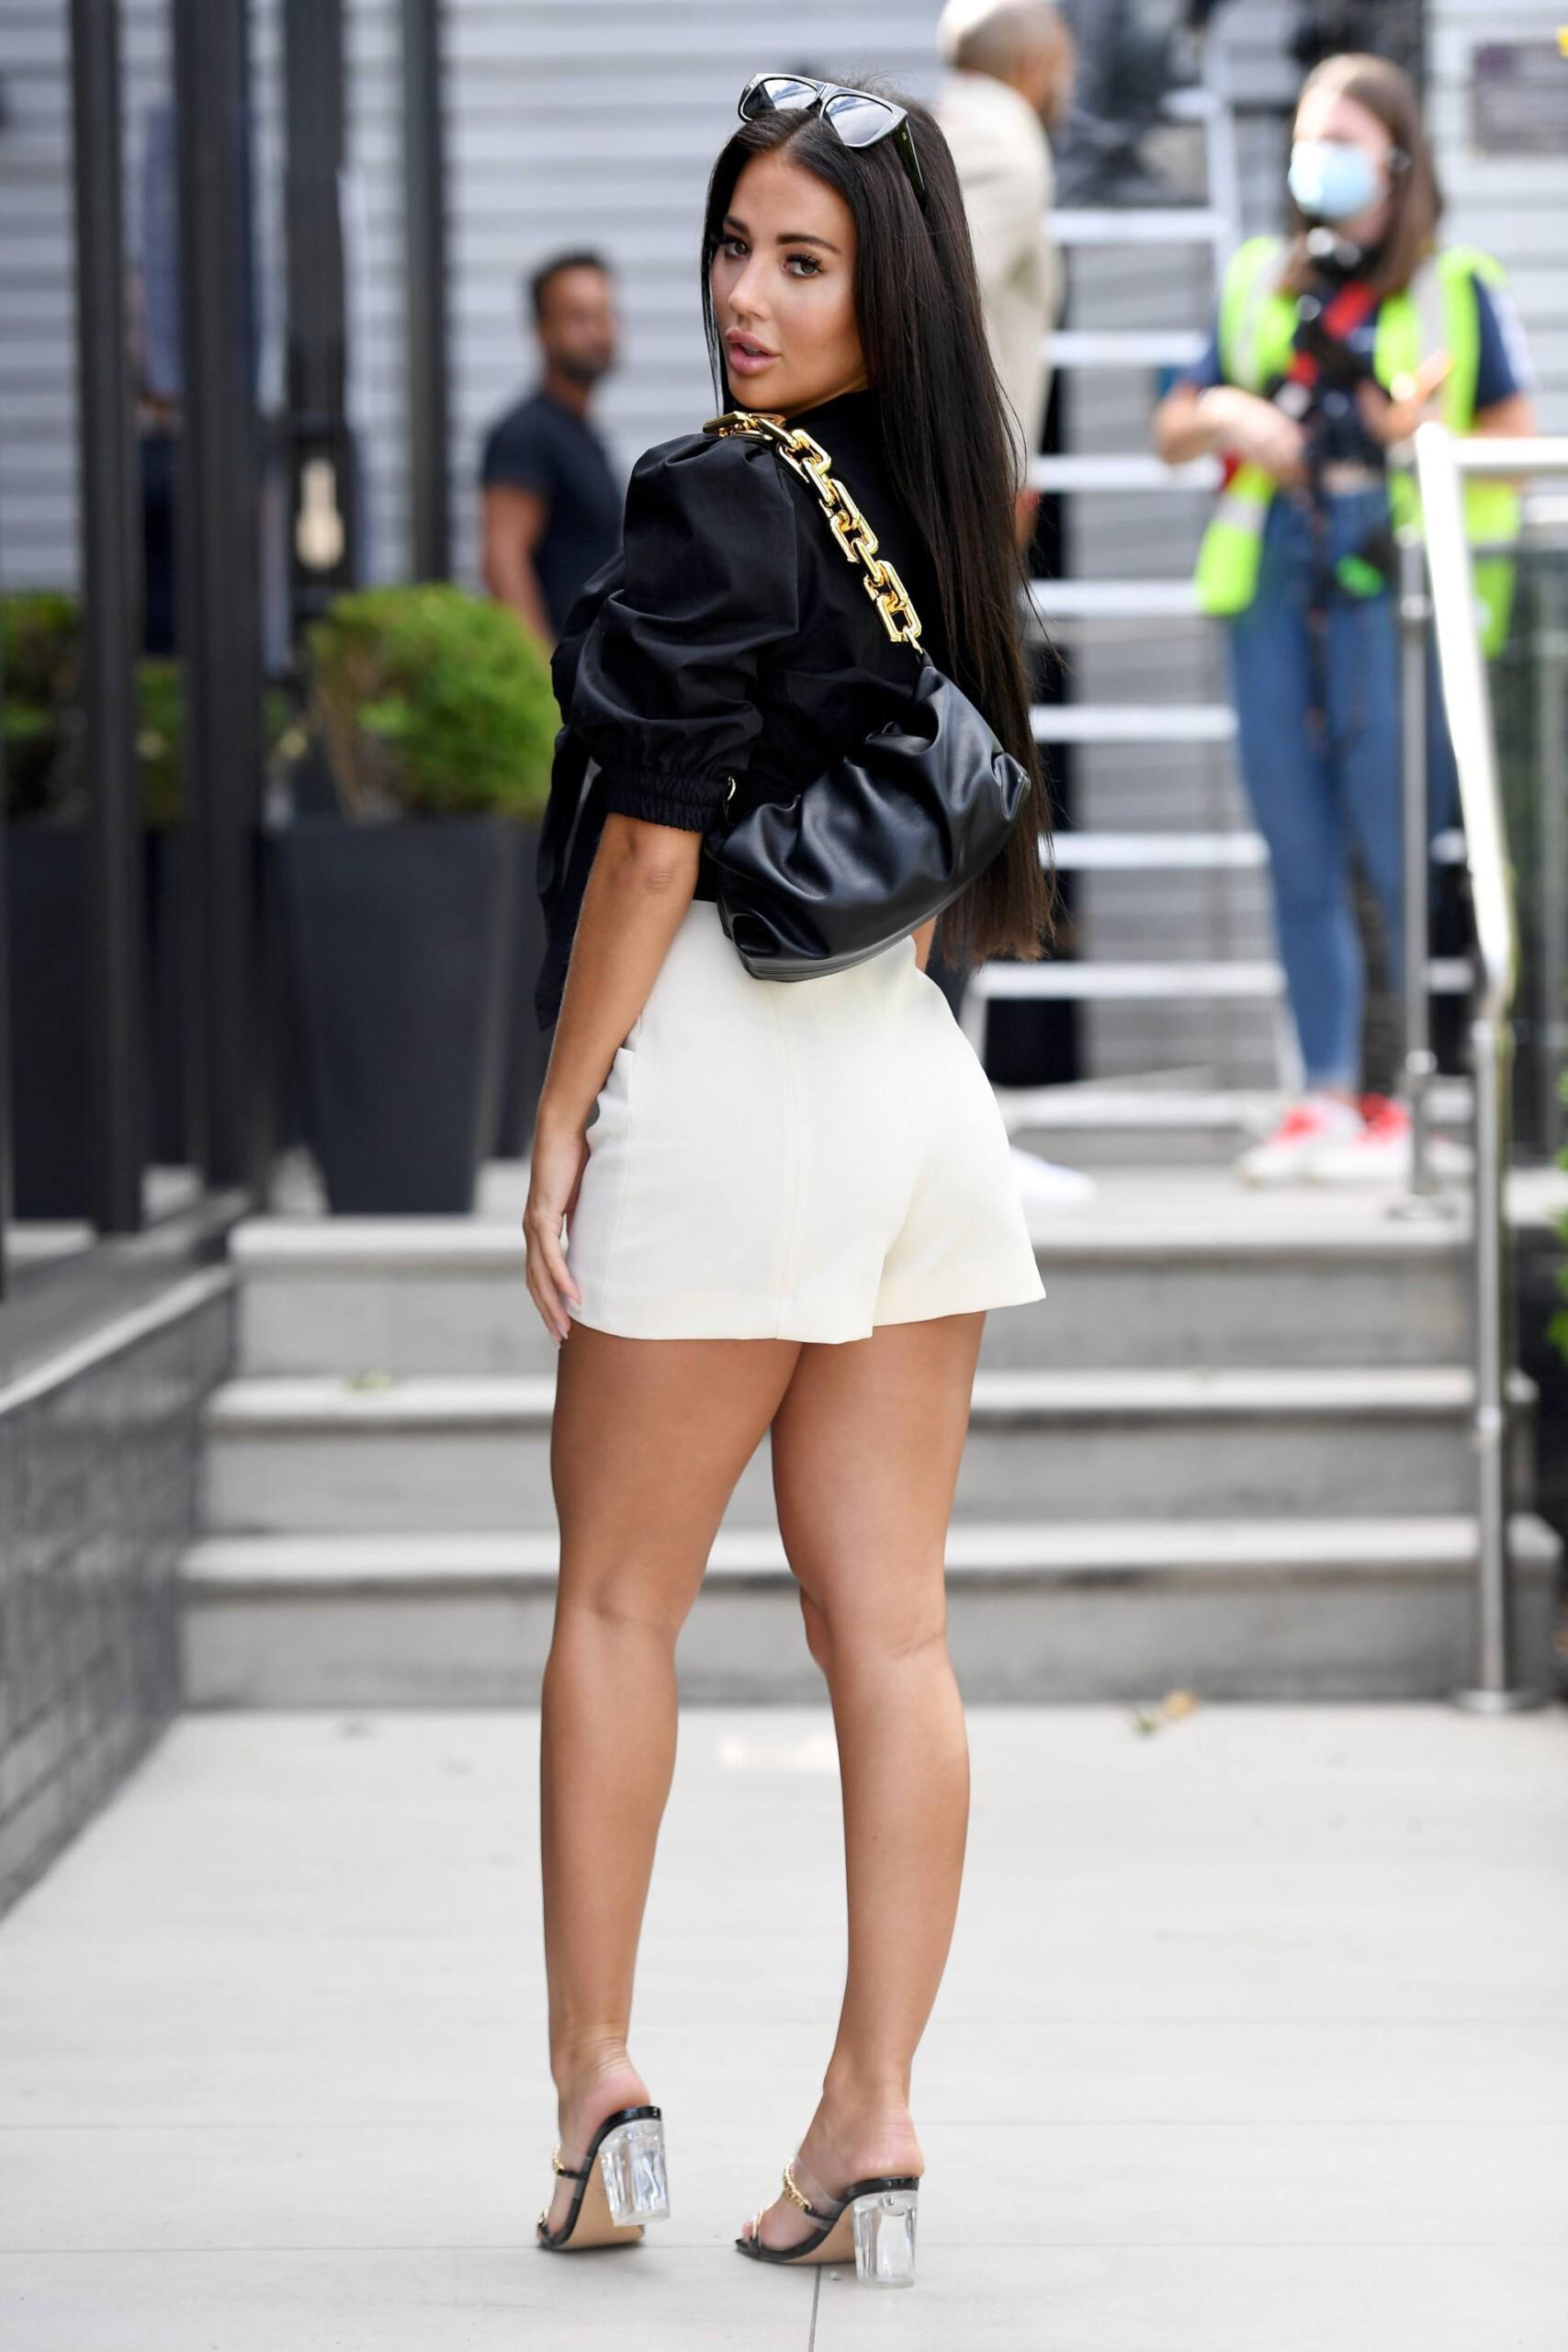 Yazmin Oukhellou Sexy Legs